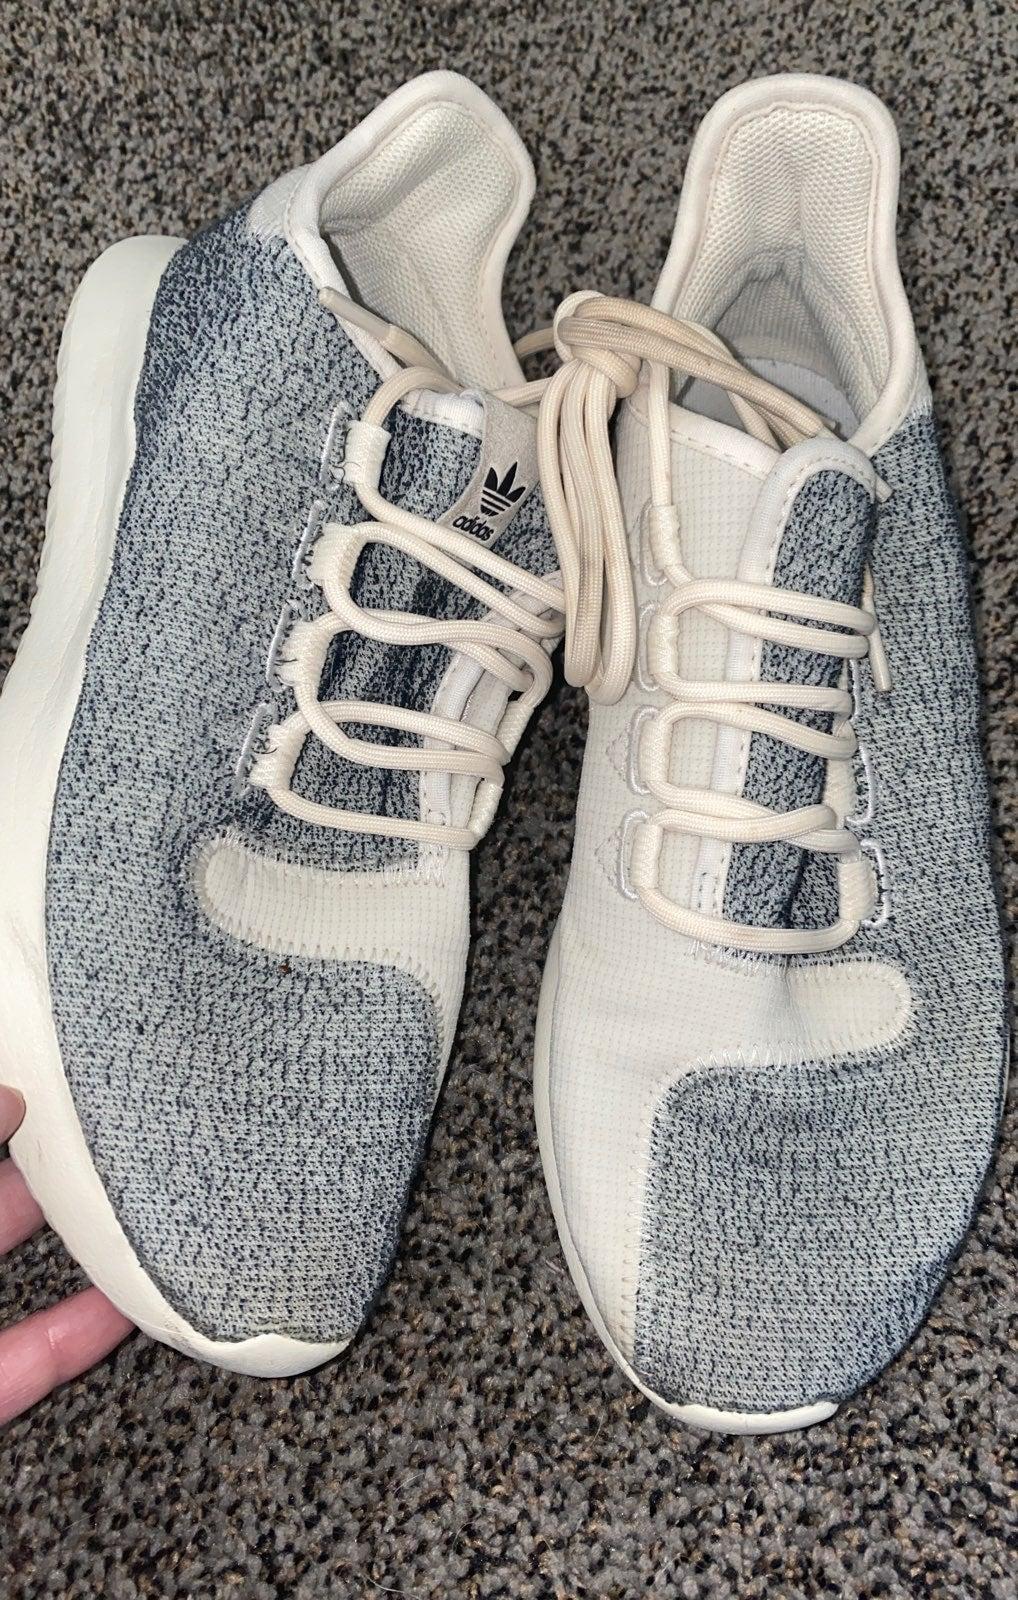 Adidas tubular tennis shoes mens size 7